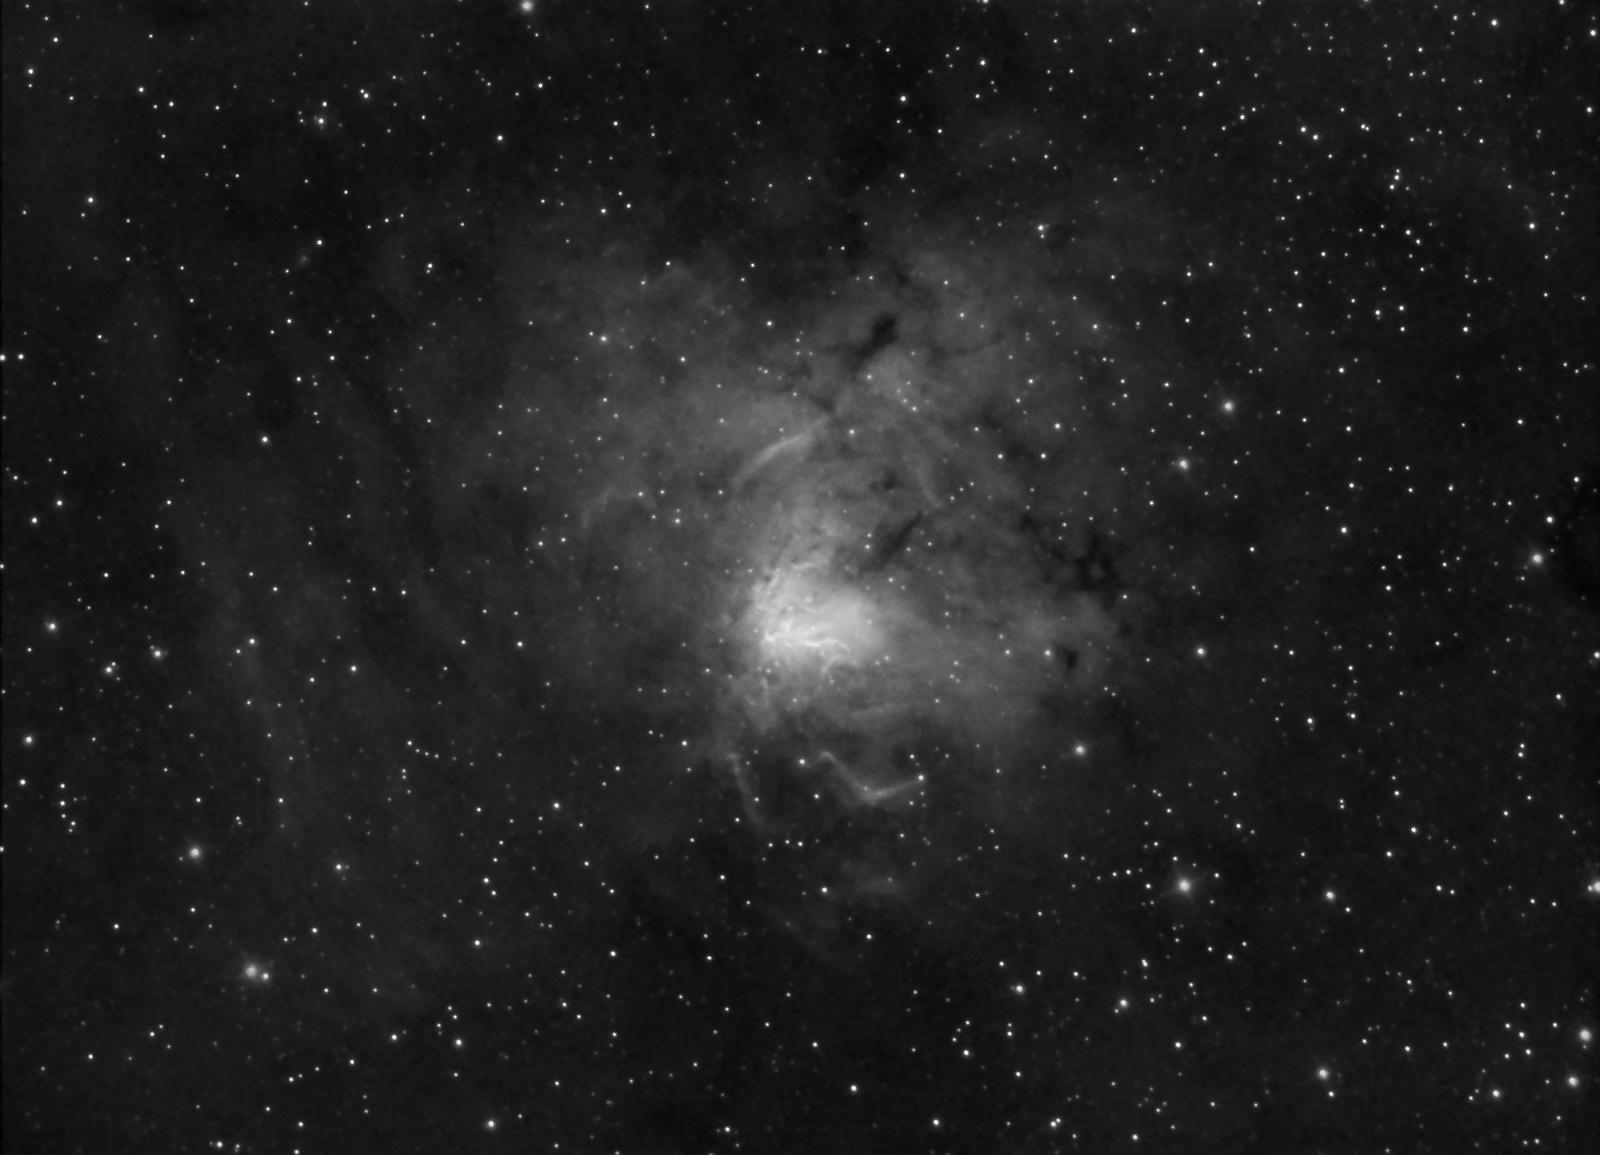 NGC1491_FL.thumb.jpg.68cb2b8de088bf32ec56a471db4da335.jpg